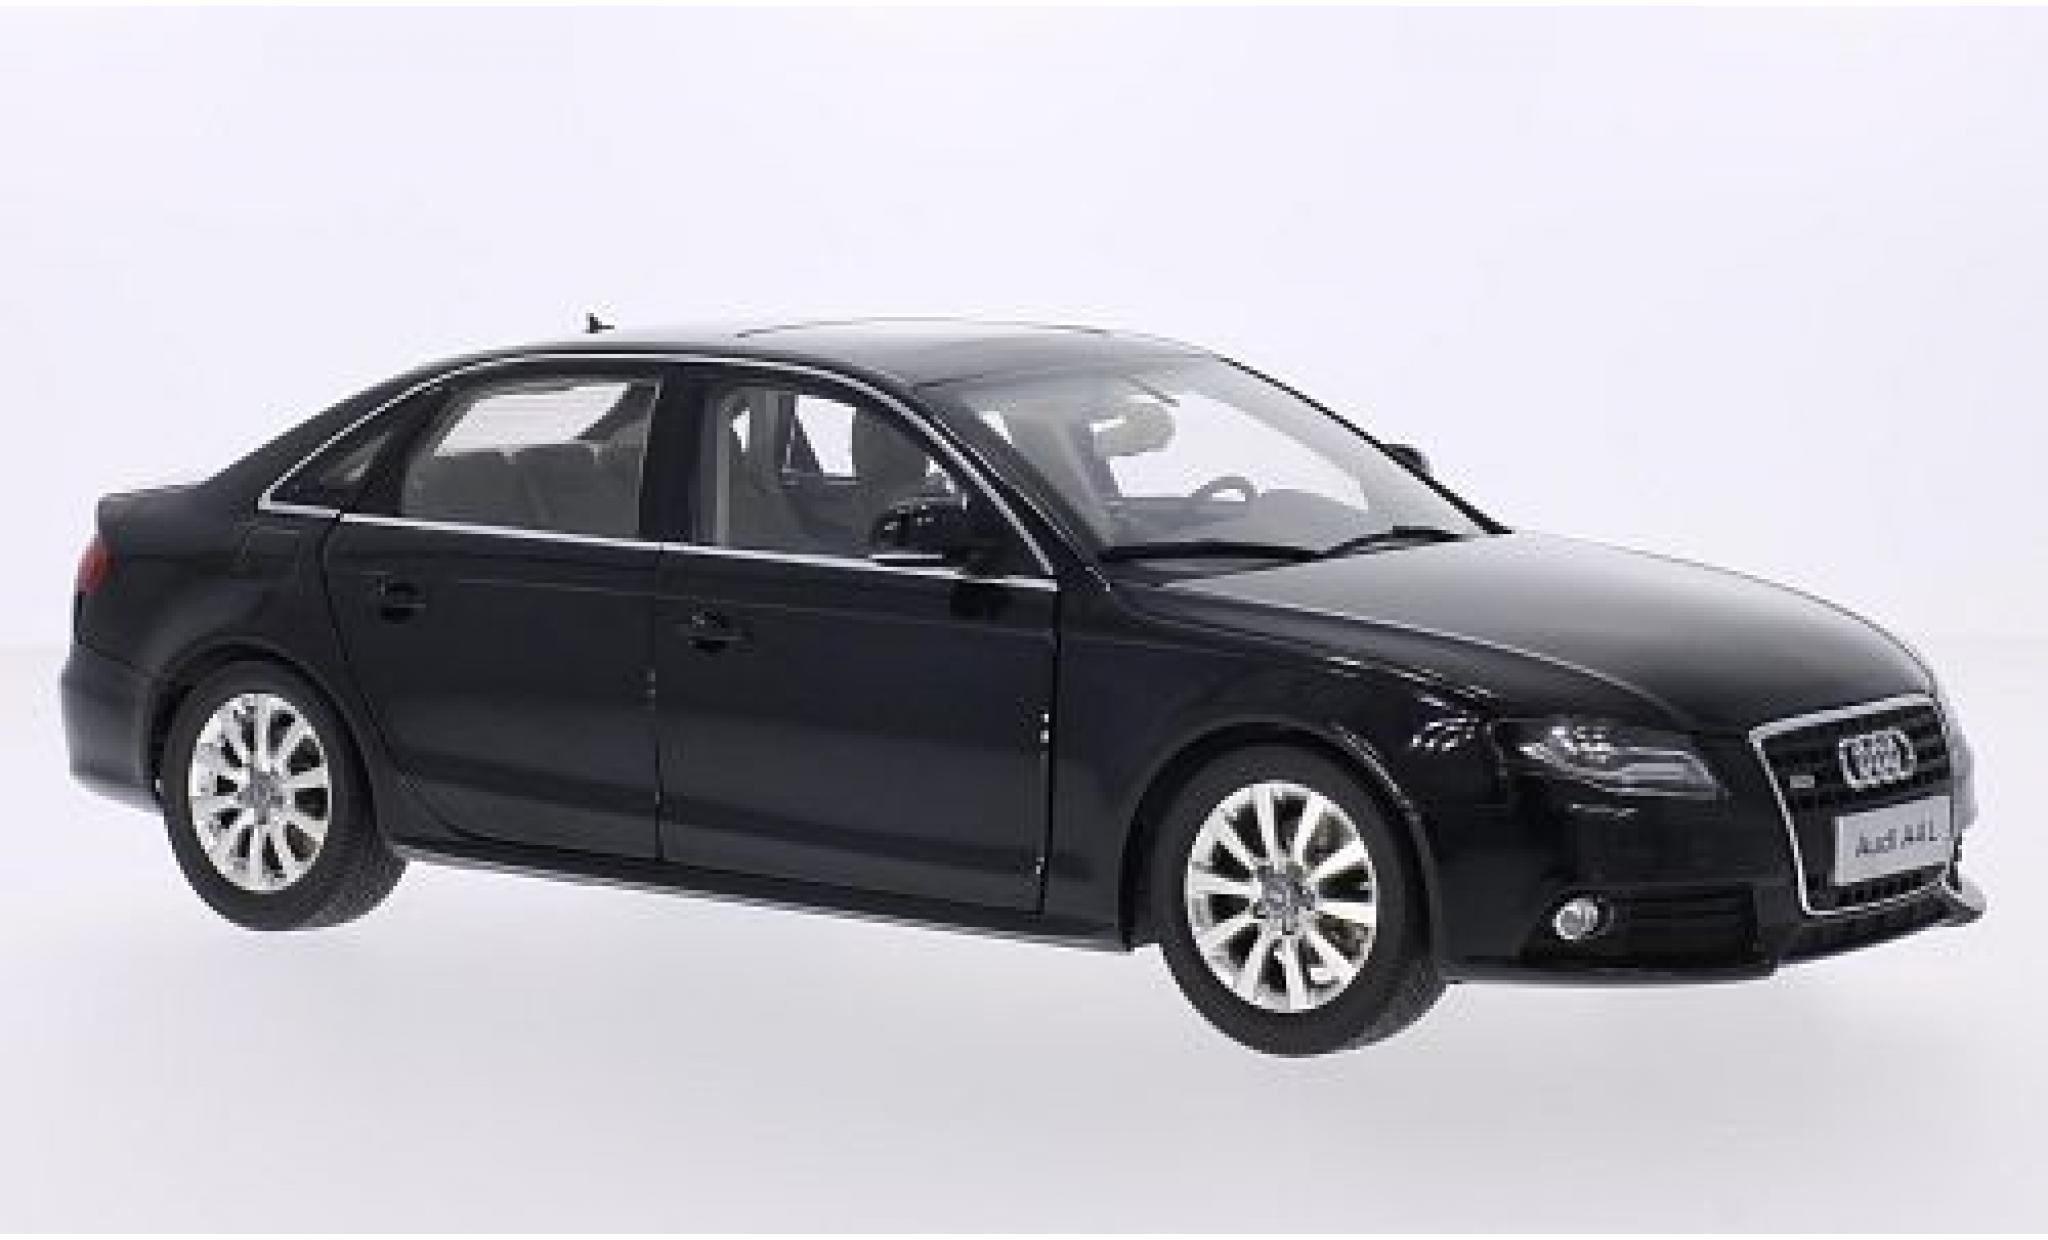 Audi A4 1/18 Paudi L (B8) metallise noire 2011